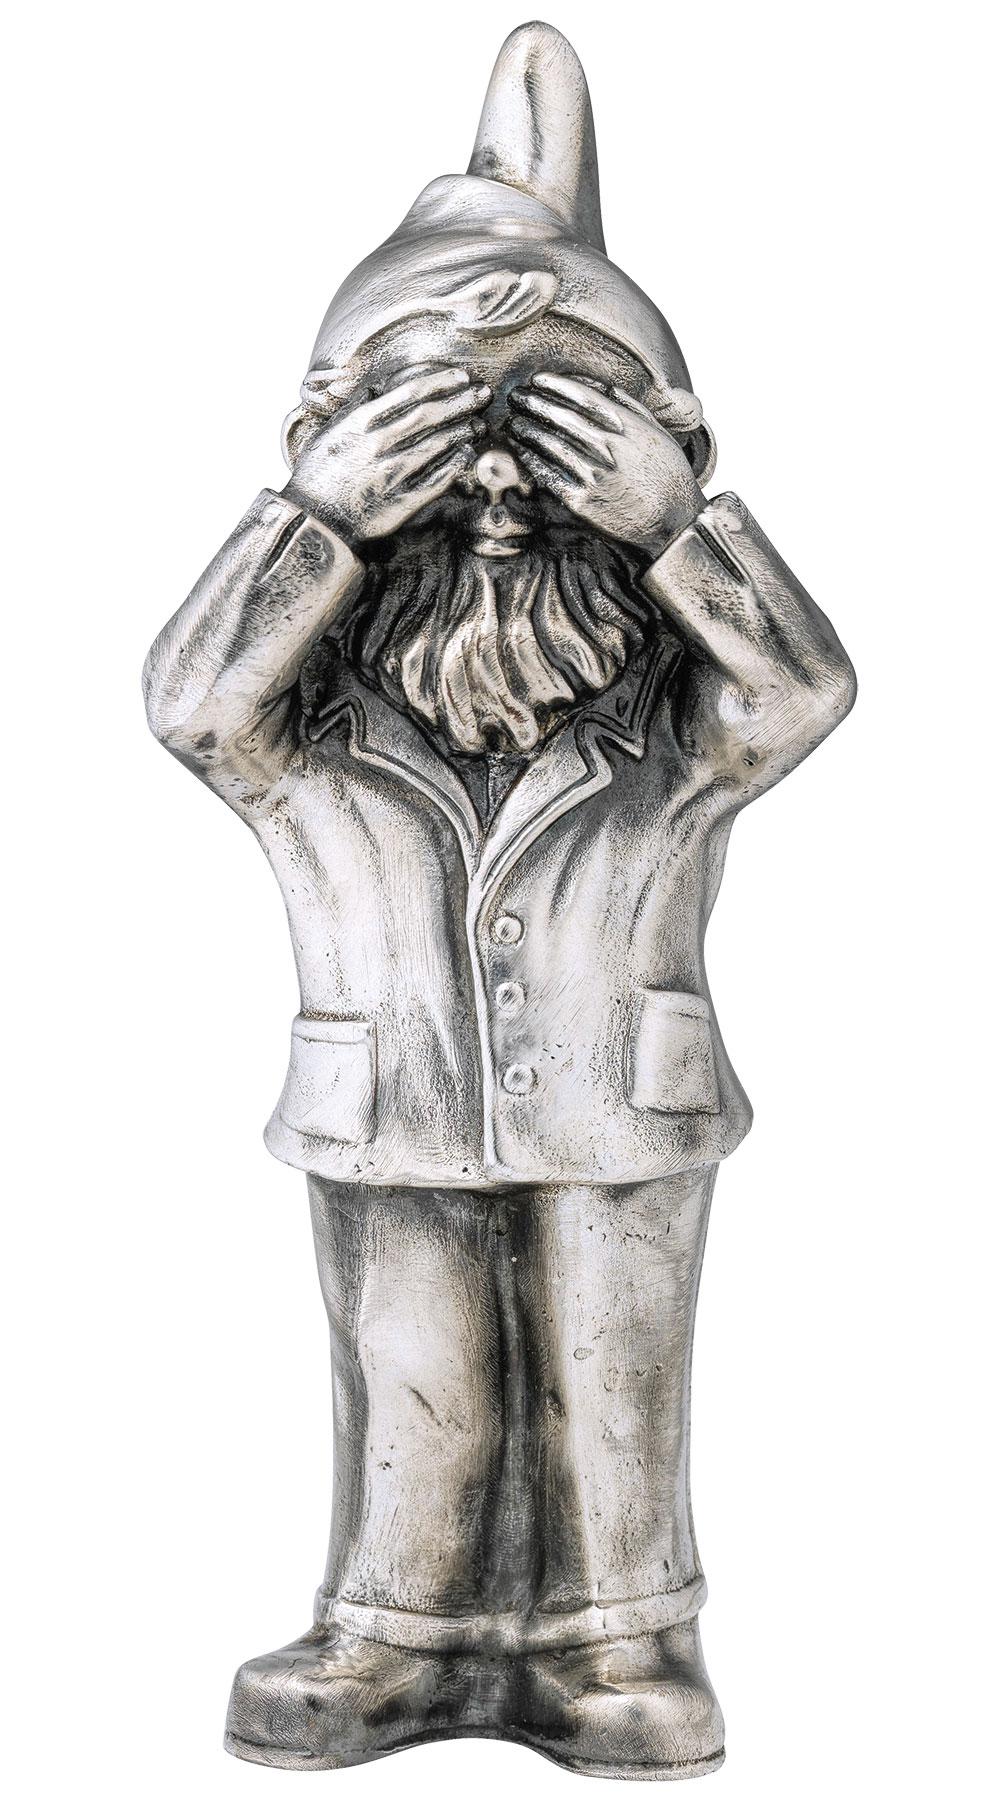 "Skulptur ""Geheimnisträger - Nichts sehen"", Version versilbert"